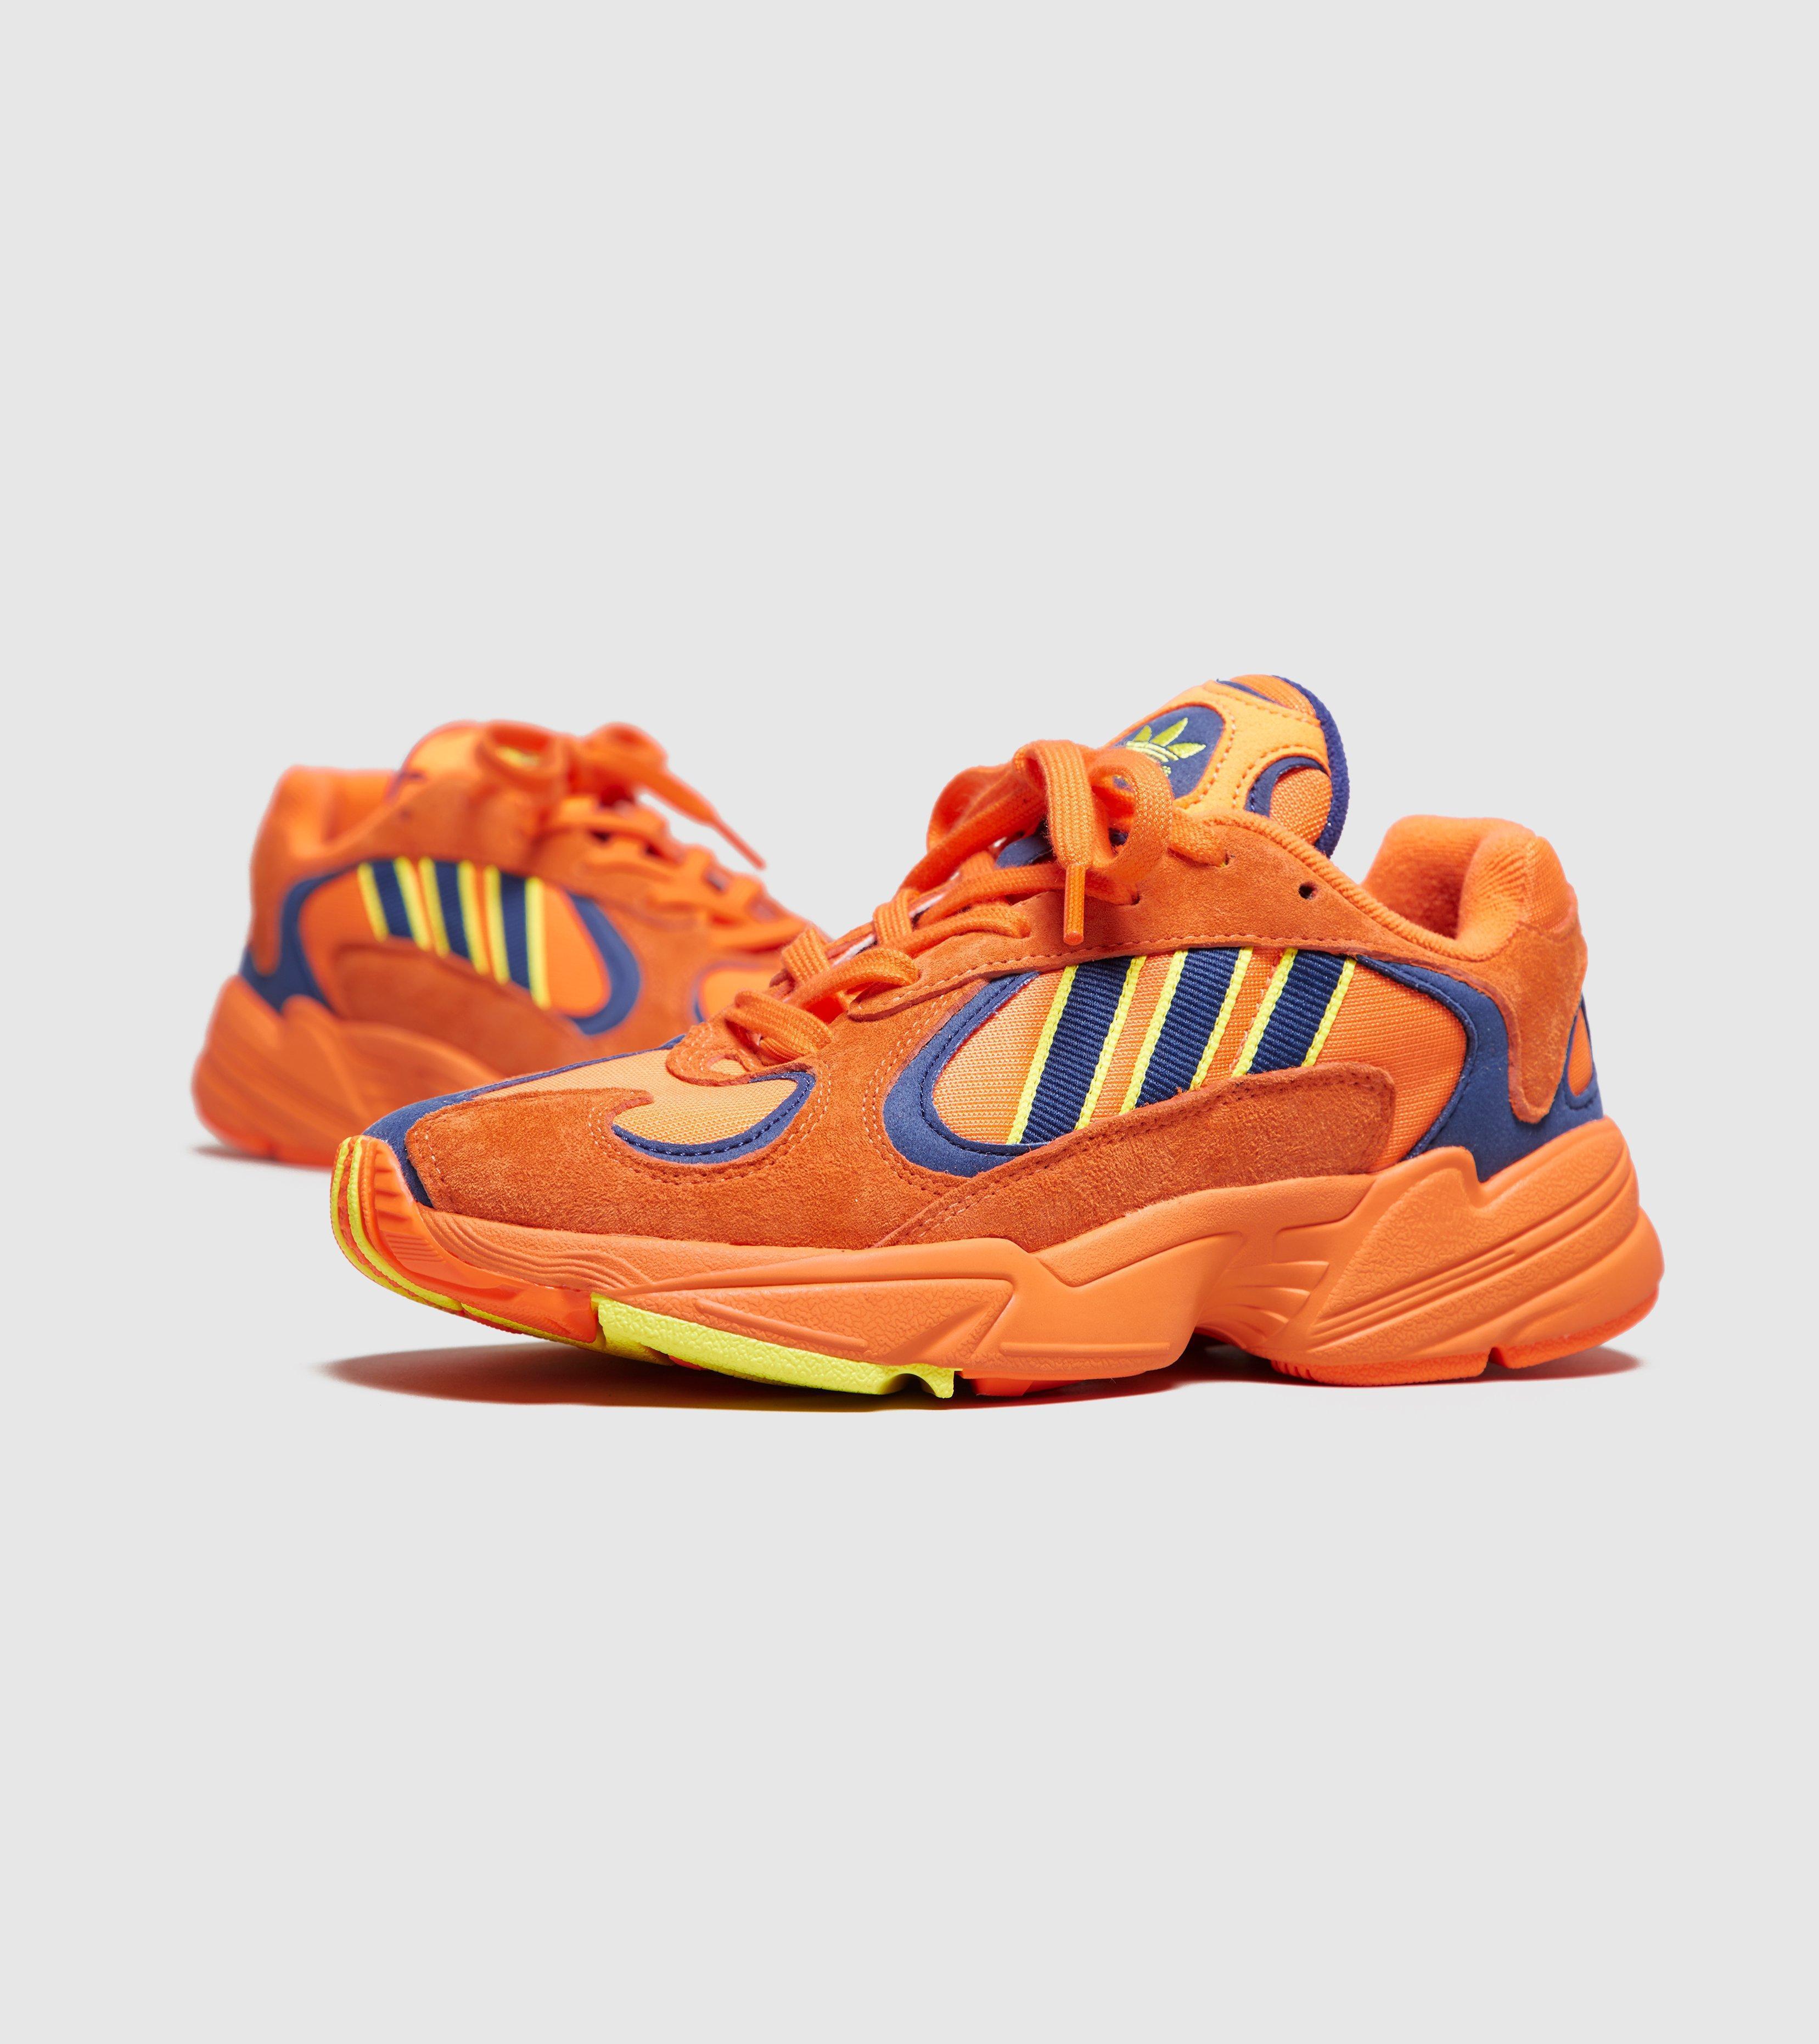 d627590730e8d Adidas Orange Yung-1 Women's